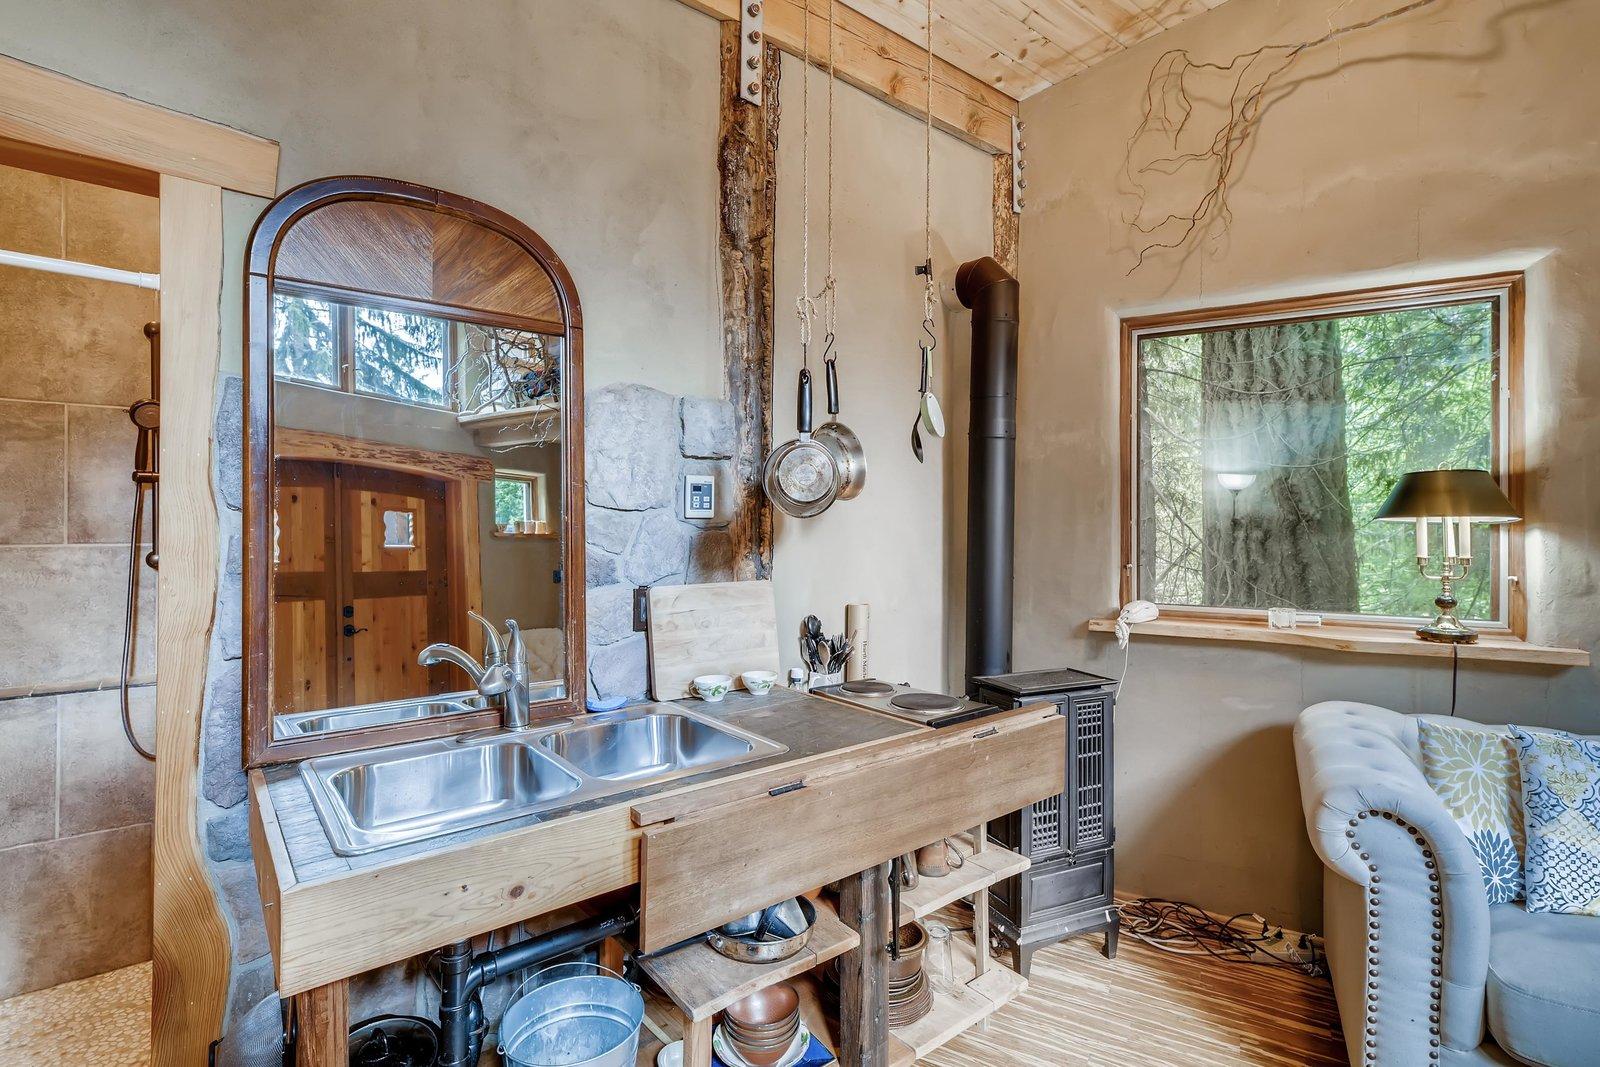 Sharingwood cob home kitchen